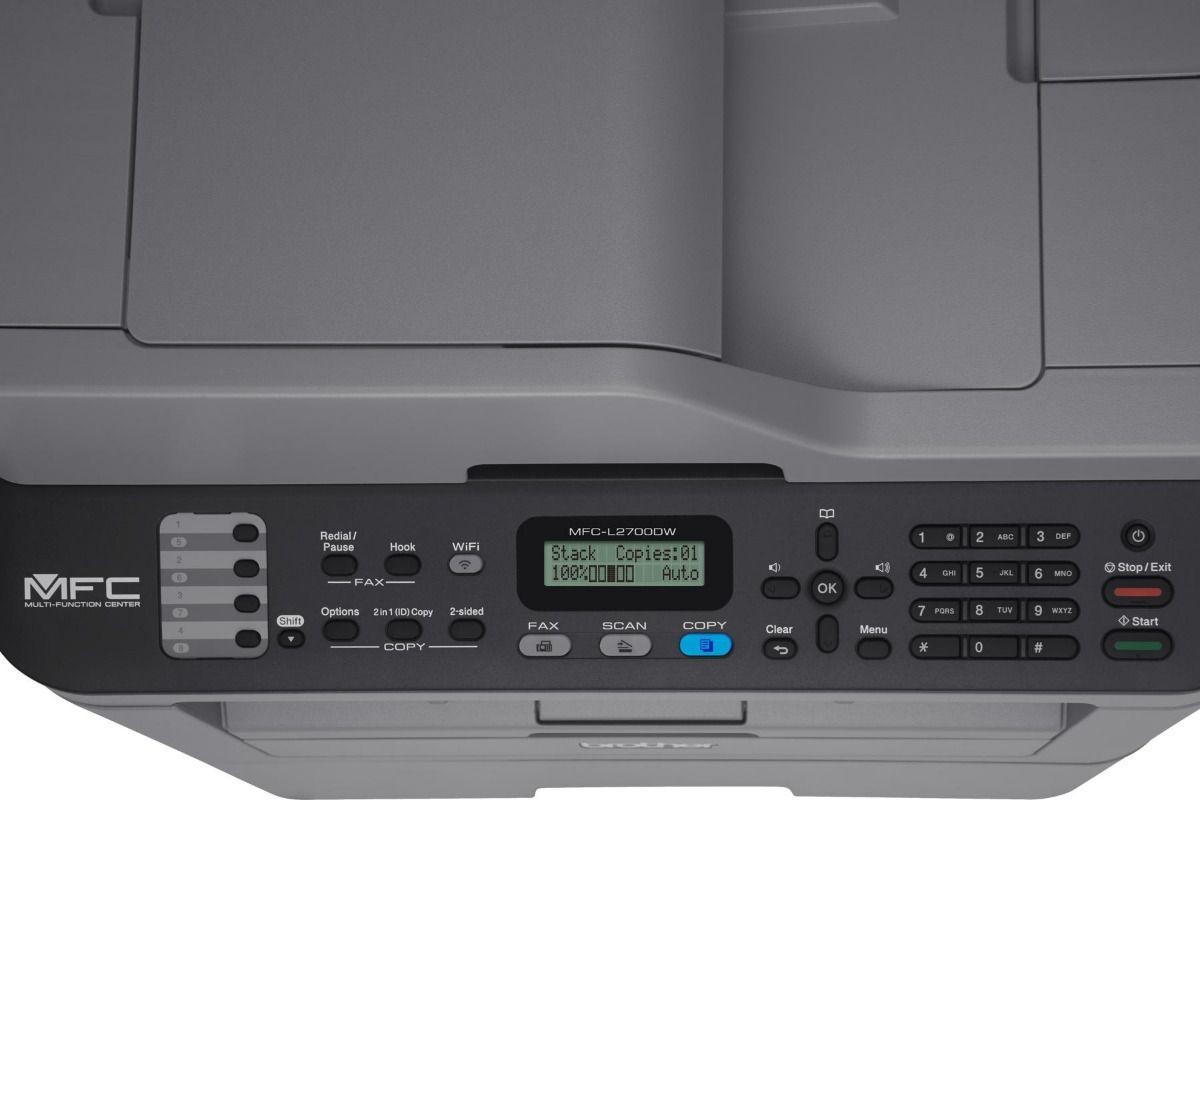 Multifuncional Monocromatica Laser MFCL2700DW Wifi Duplex